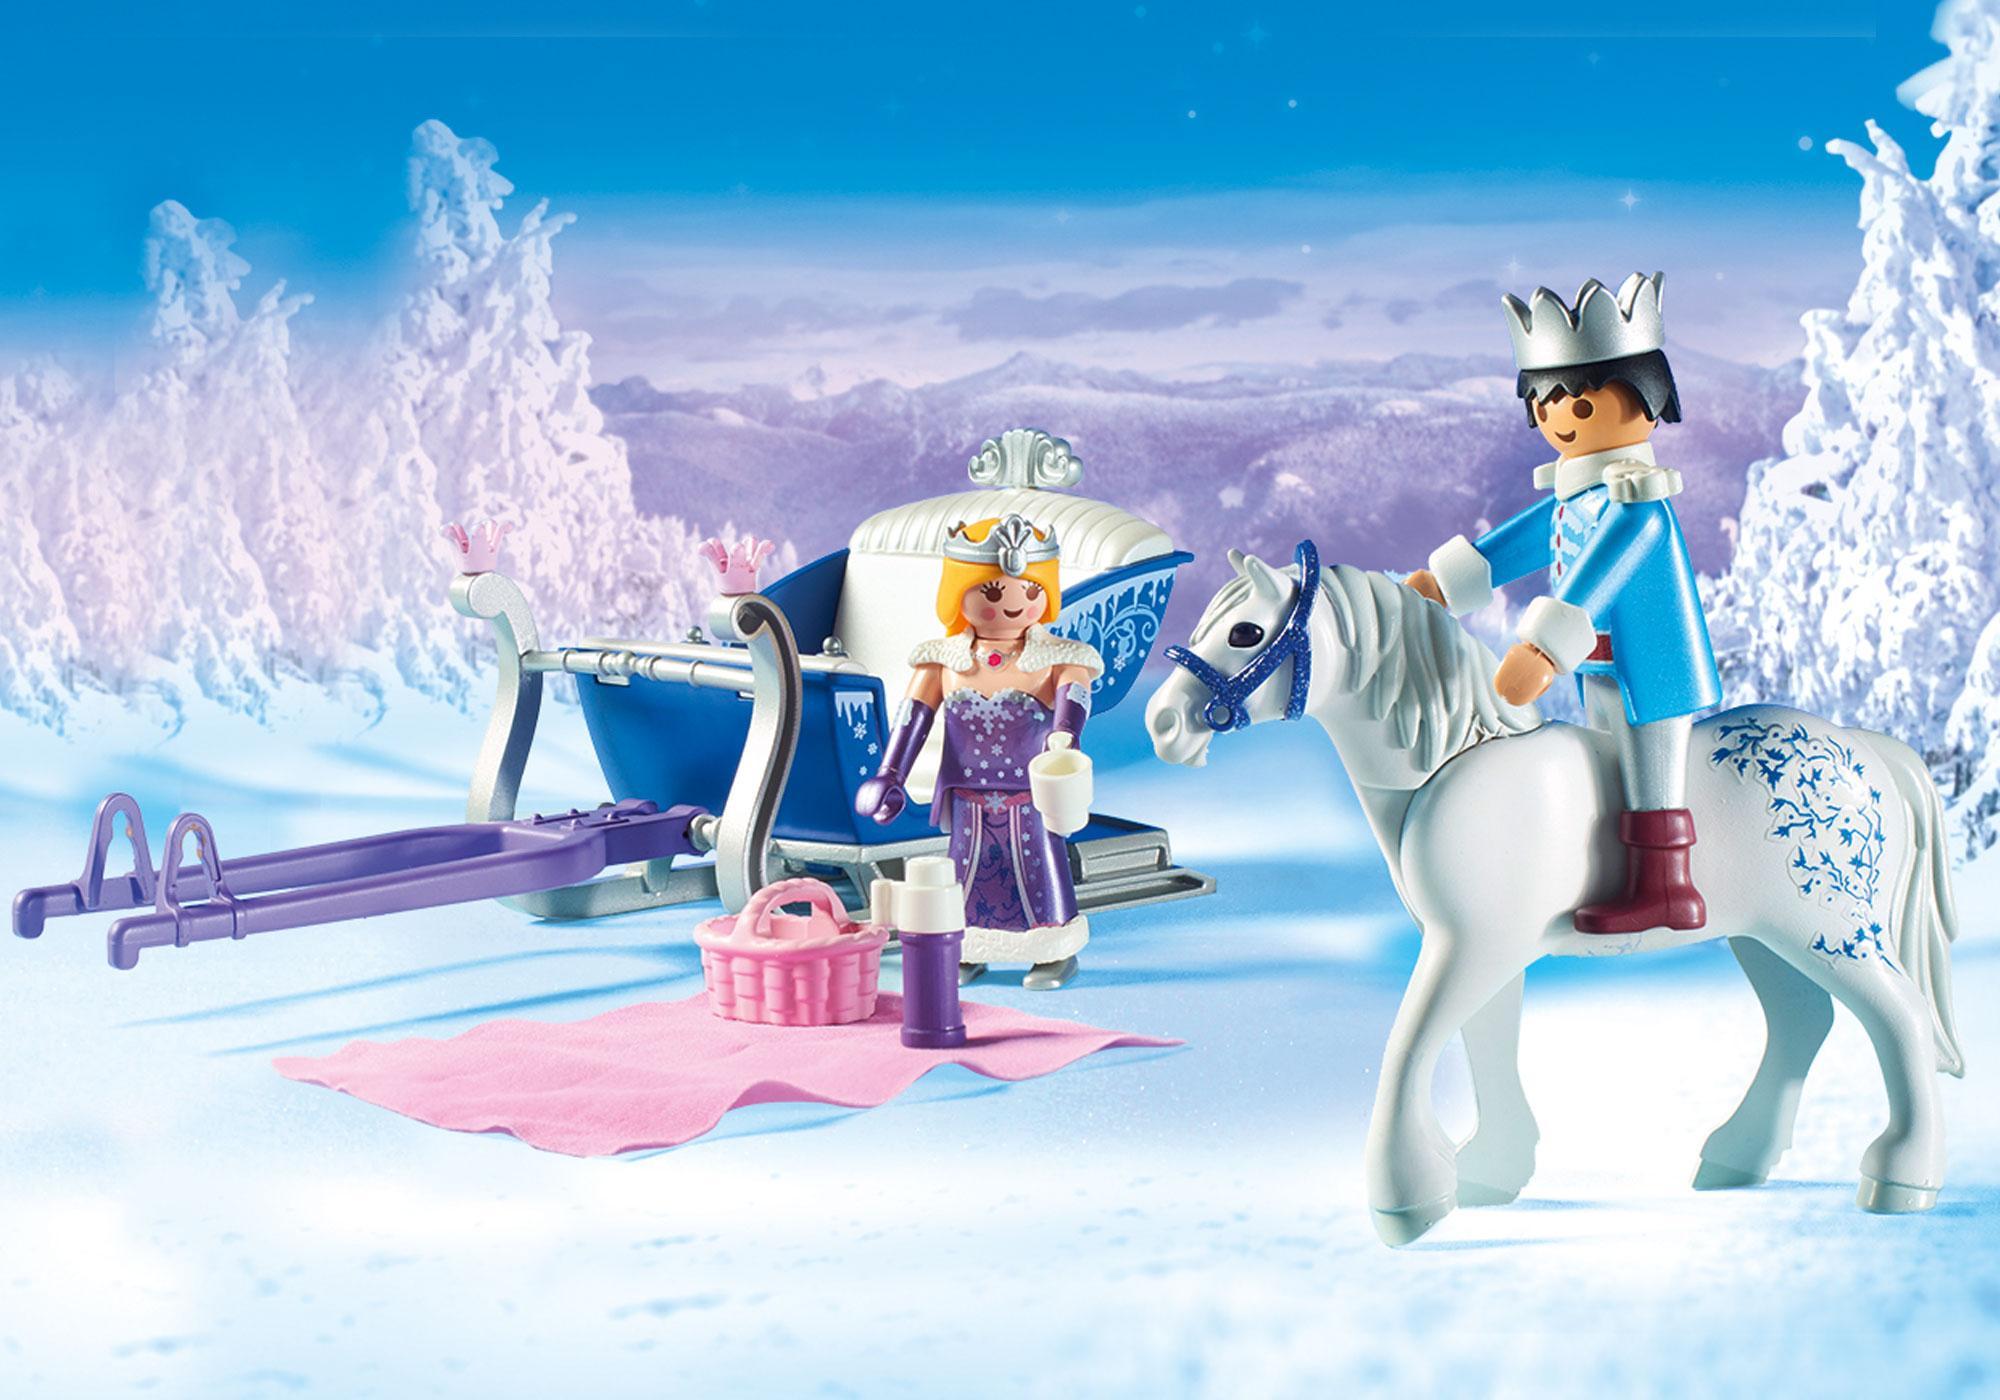 http://media.playmobil.com/i/playmobil/9474_product_extra1/Koninklijk paar met slee